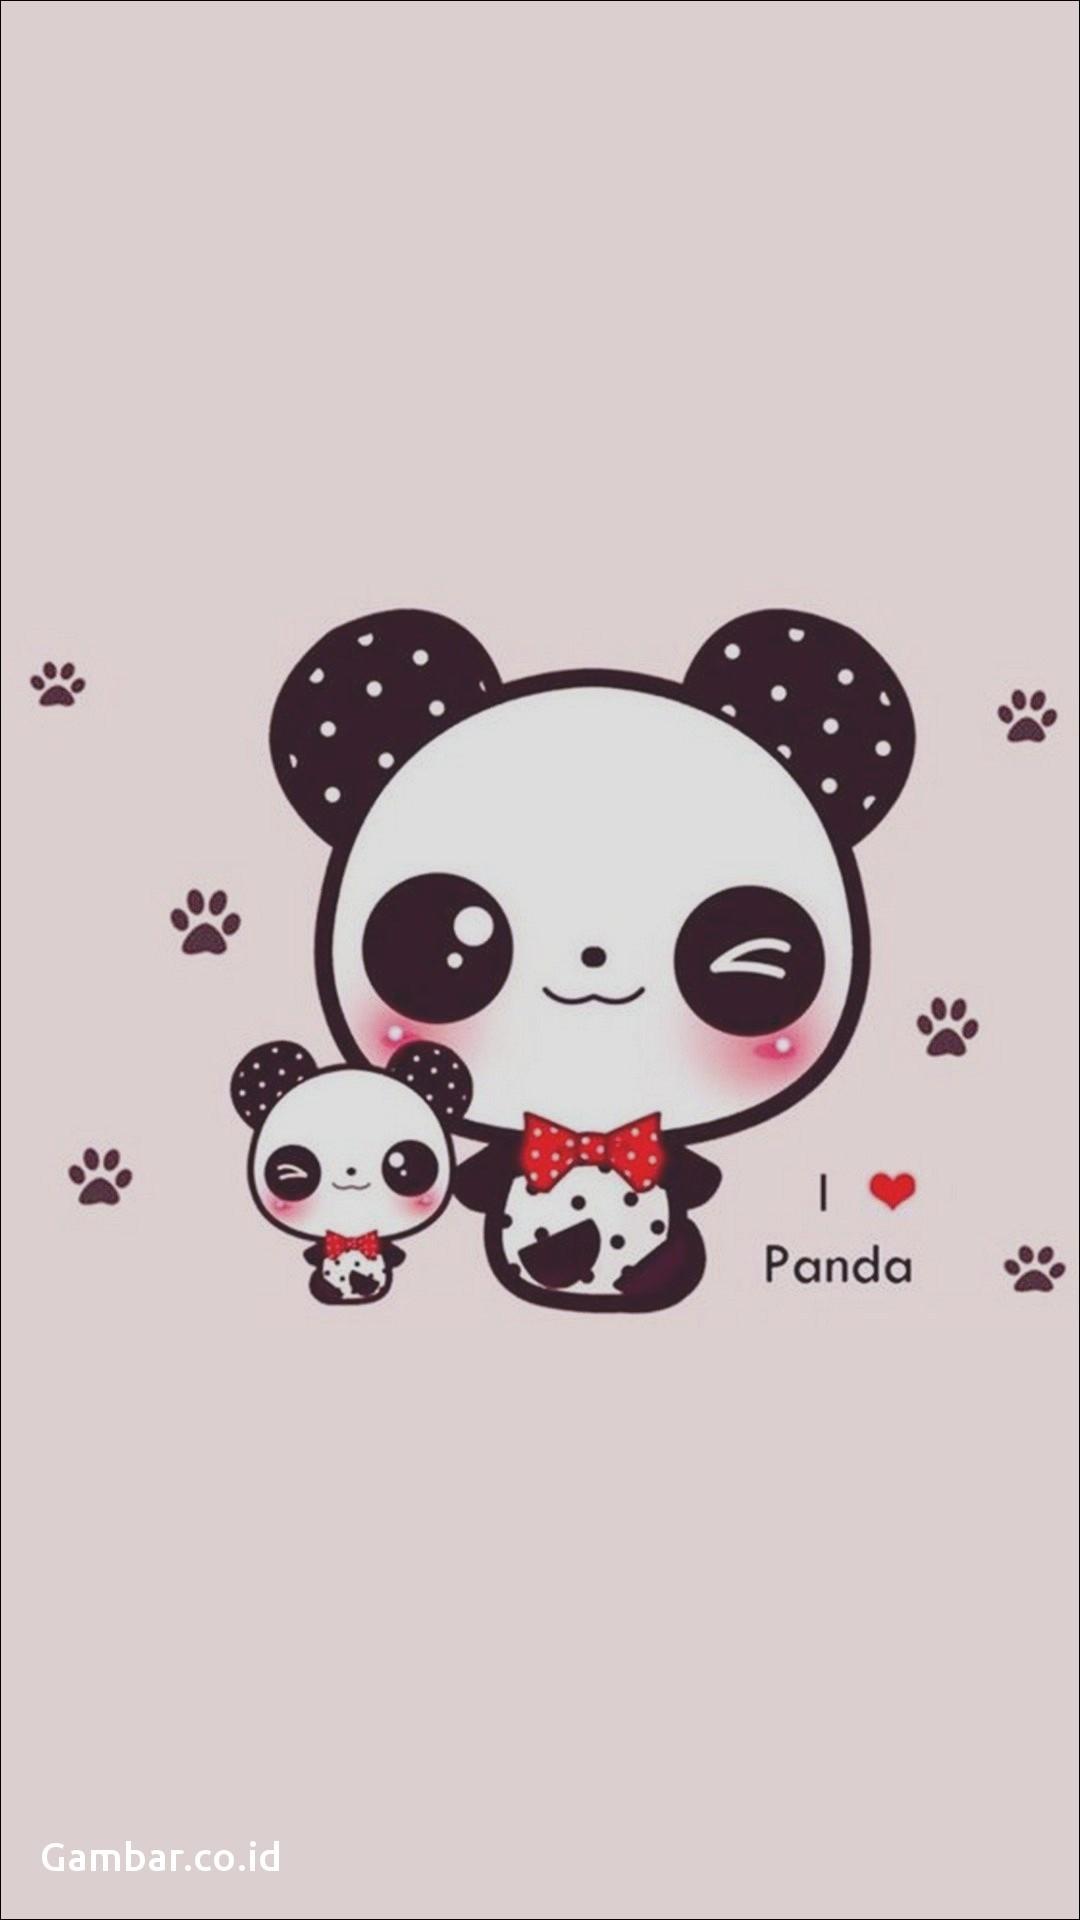 Gambar Wallpaper Tumblr Panda Posted By John Walker